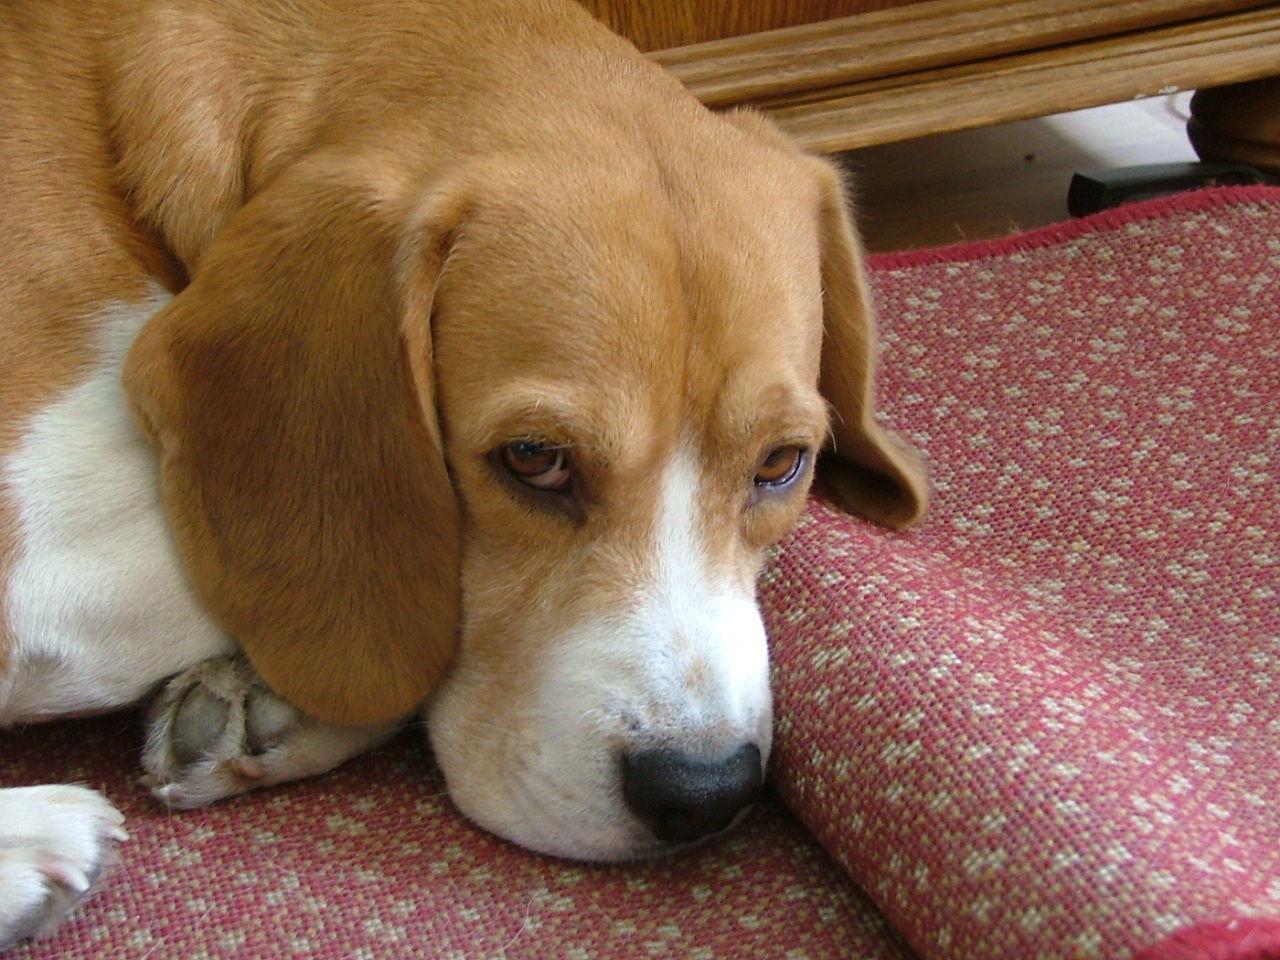 Animal Beagle Beagle Love Beaglelove Beaglelovers Beaglemania Beagleoftheday Beagles  Betyár Cute Dog Home Indoors  Pets Portrait Raskal